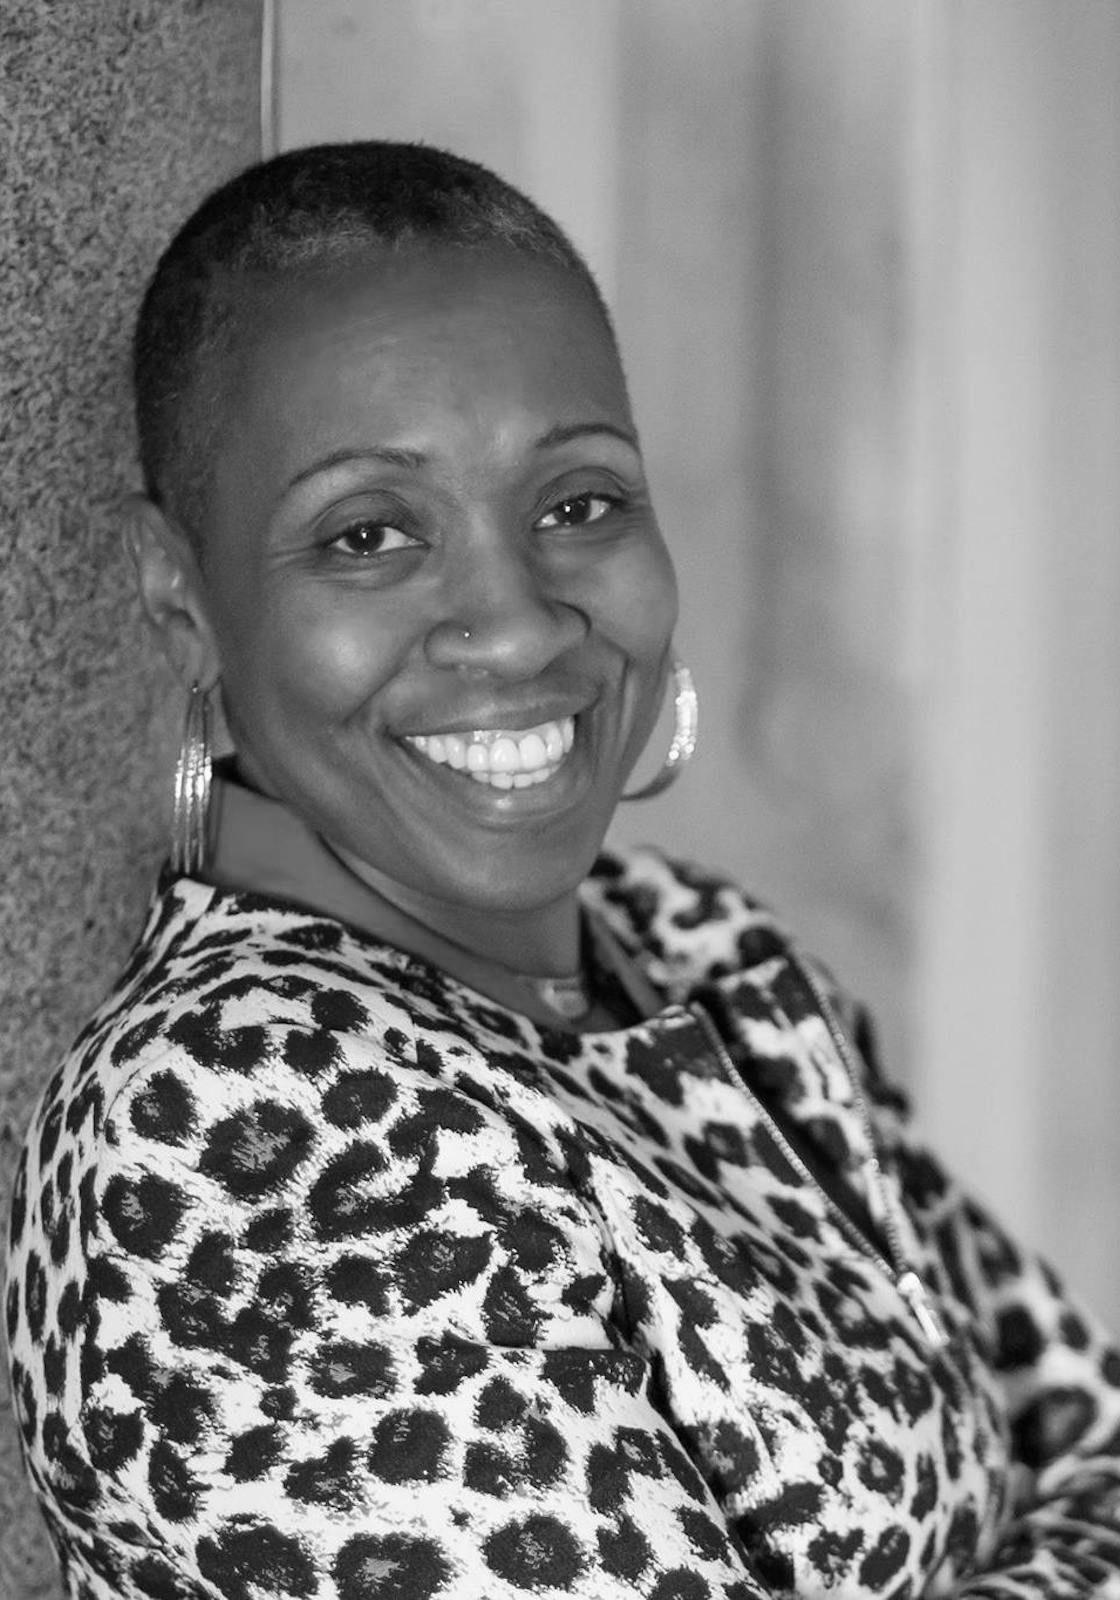 Robyn Porter, Willoughby Avenue, The Five Fifths, KOLUMN Magazine, KOLUMN, African American Politics, Black in Politics